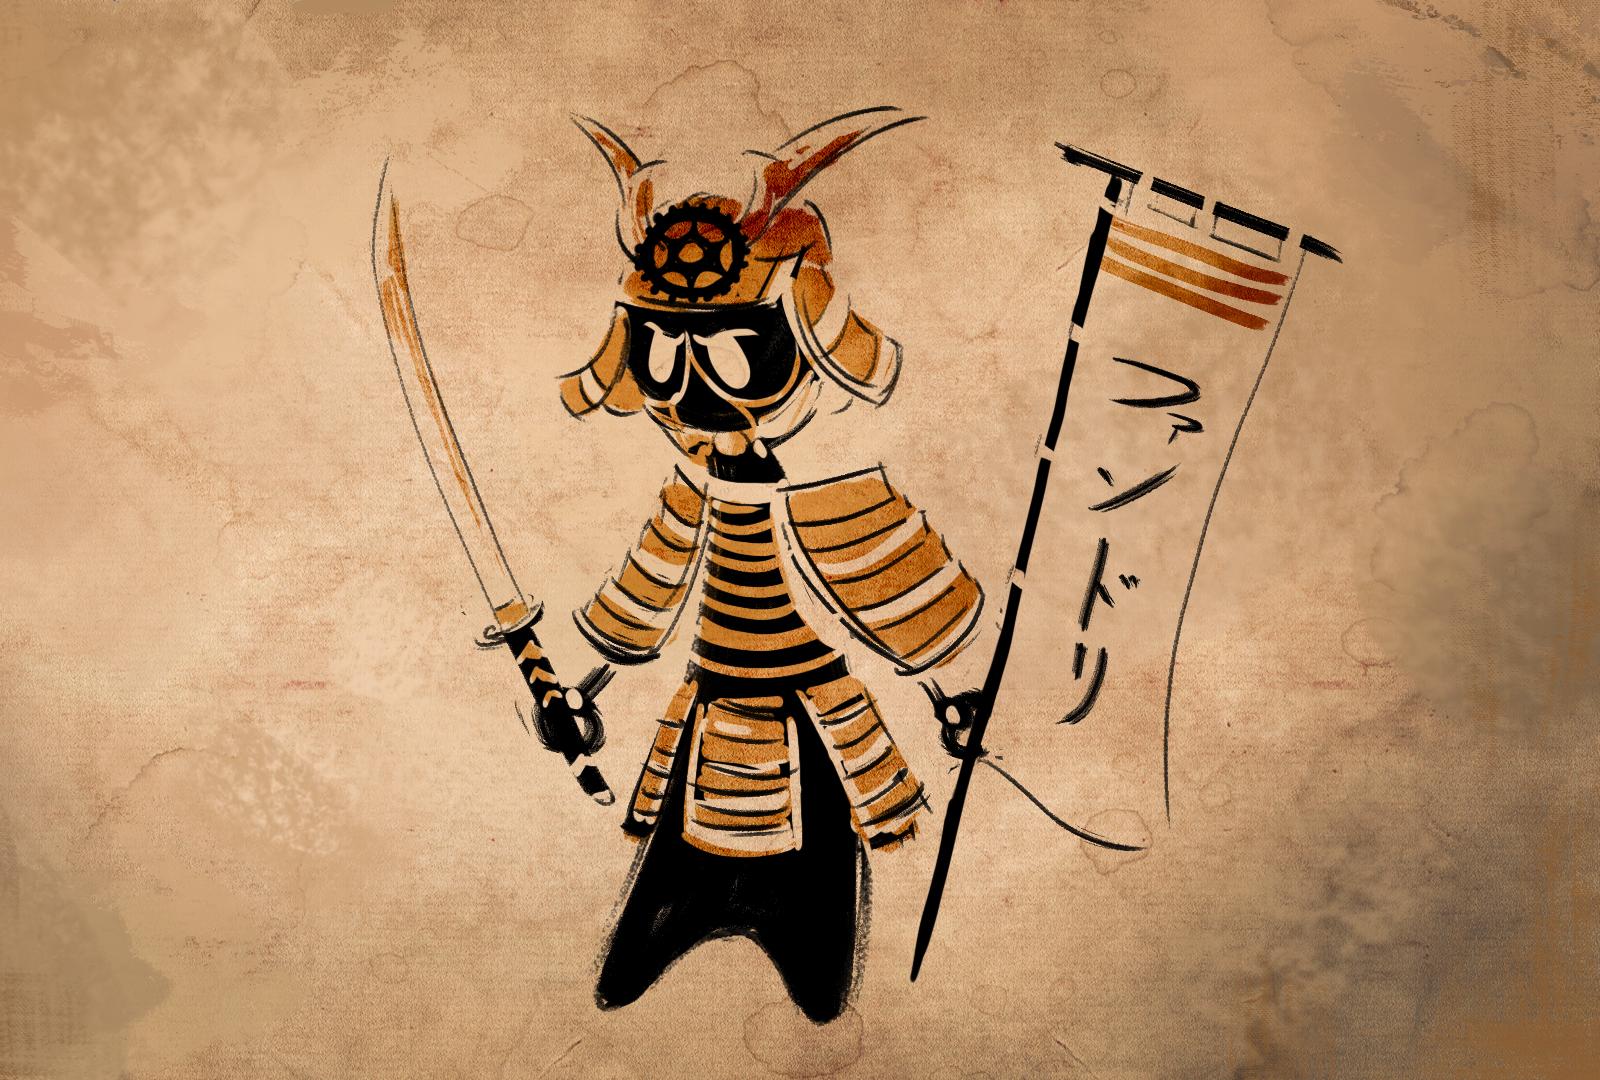 Felipe de Barros — Samurai taleoid